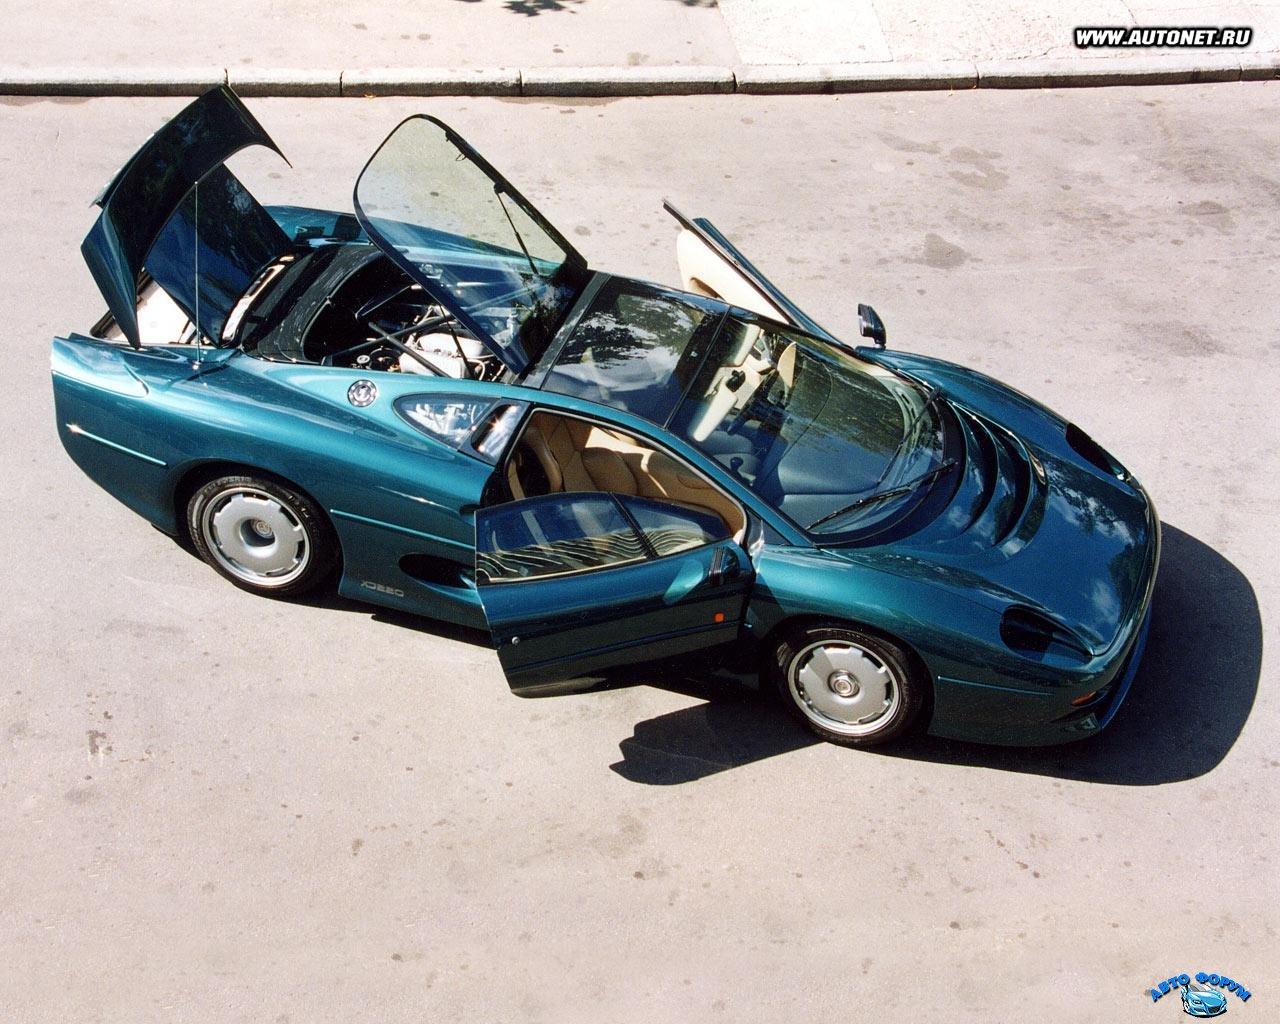 Jaguar-XJ220_mp25_pic_28675.jpg